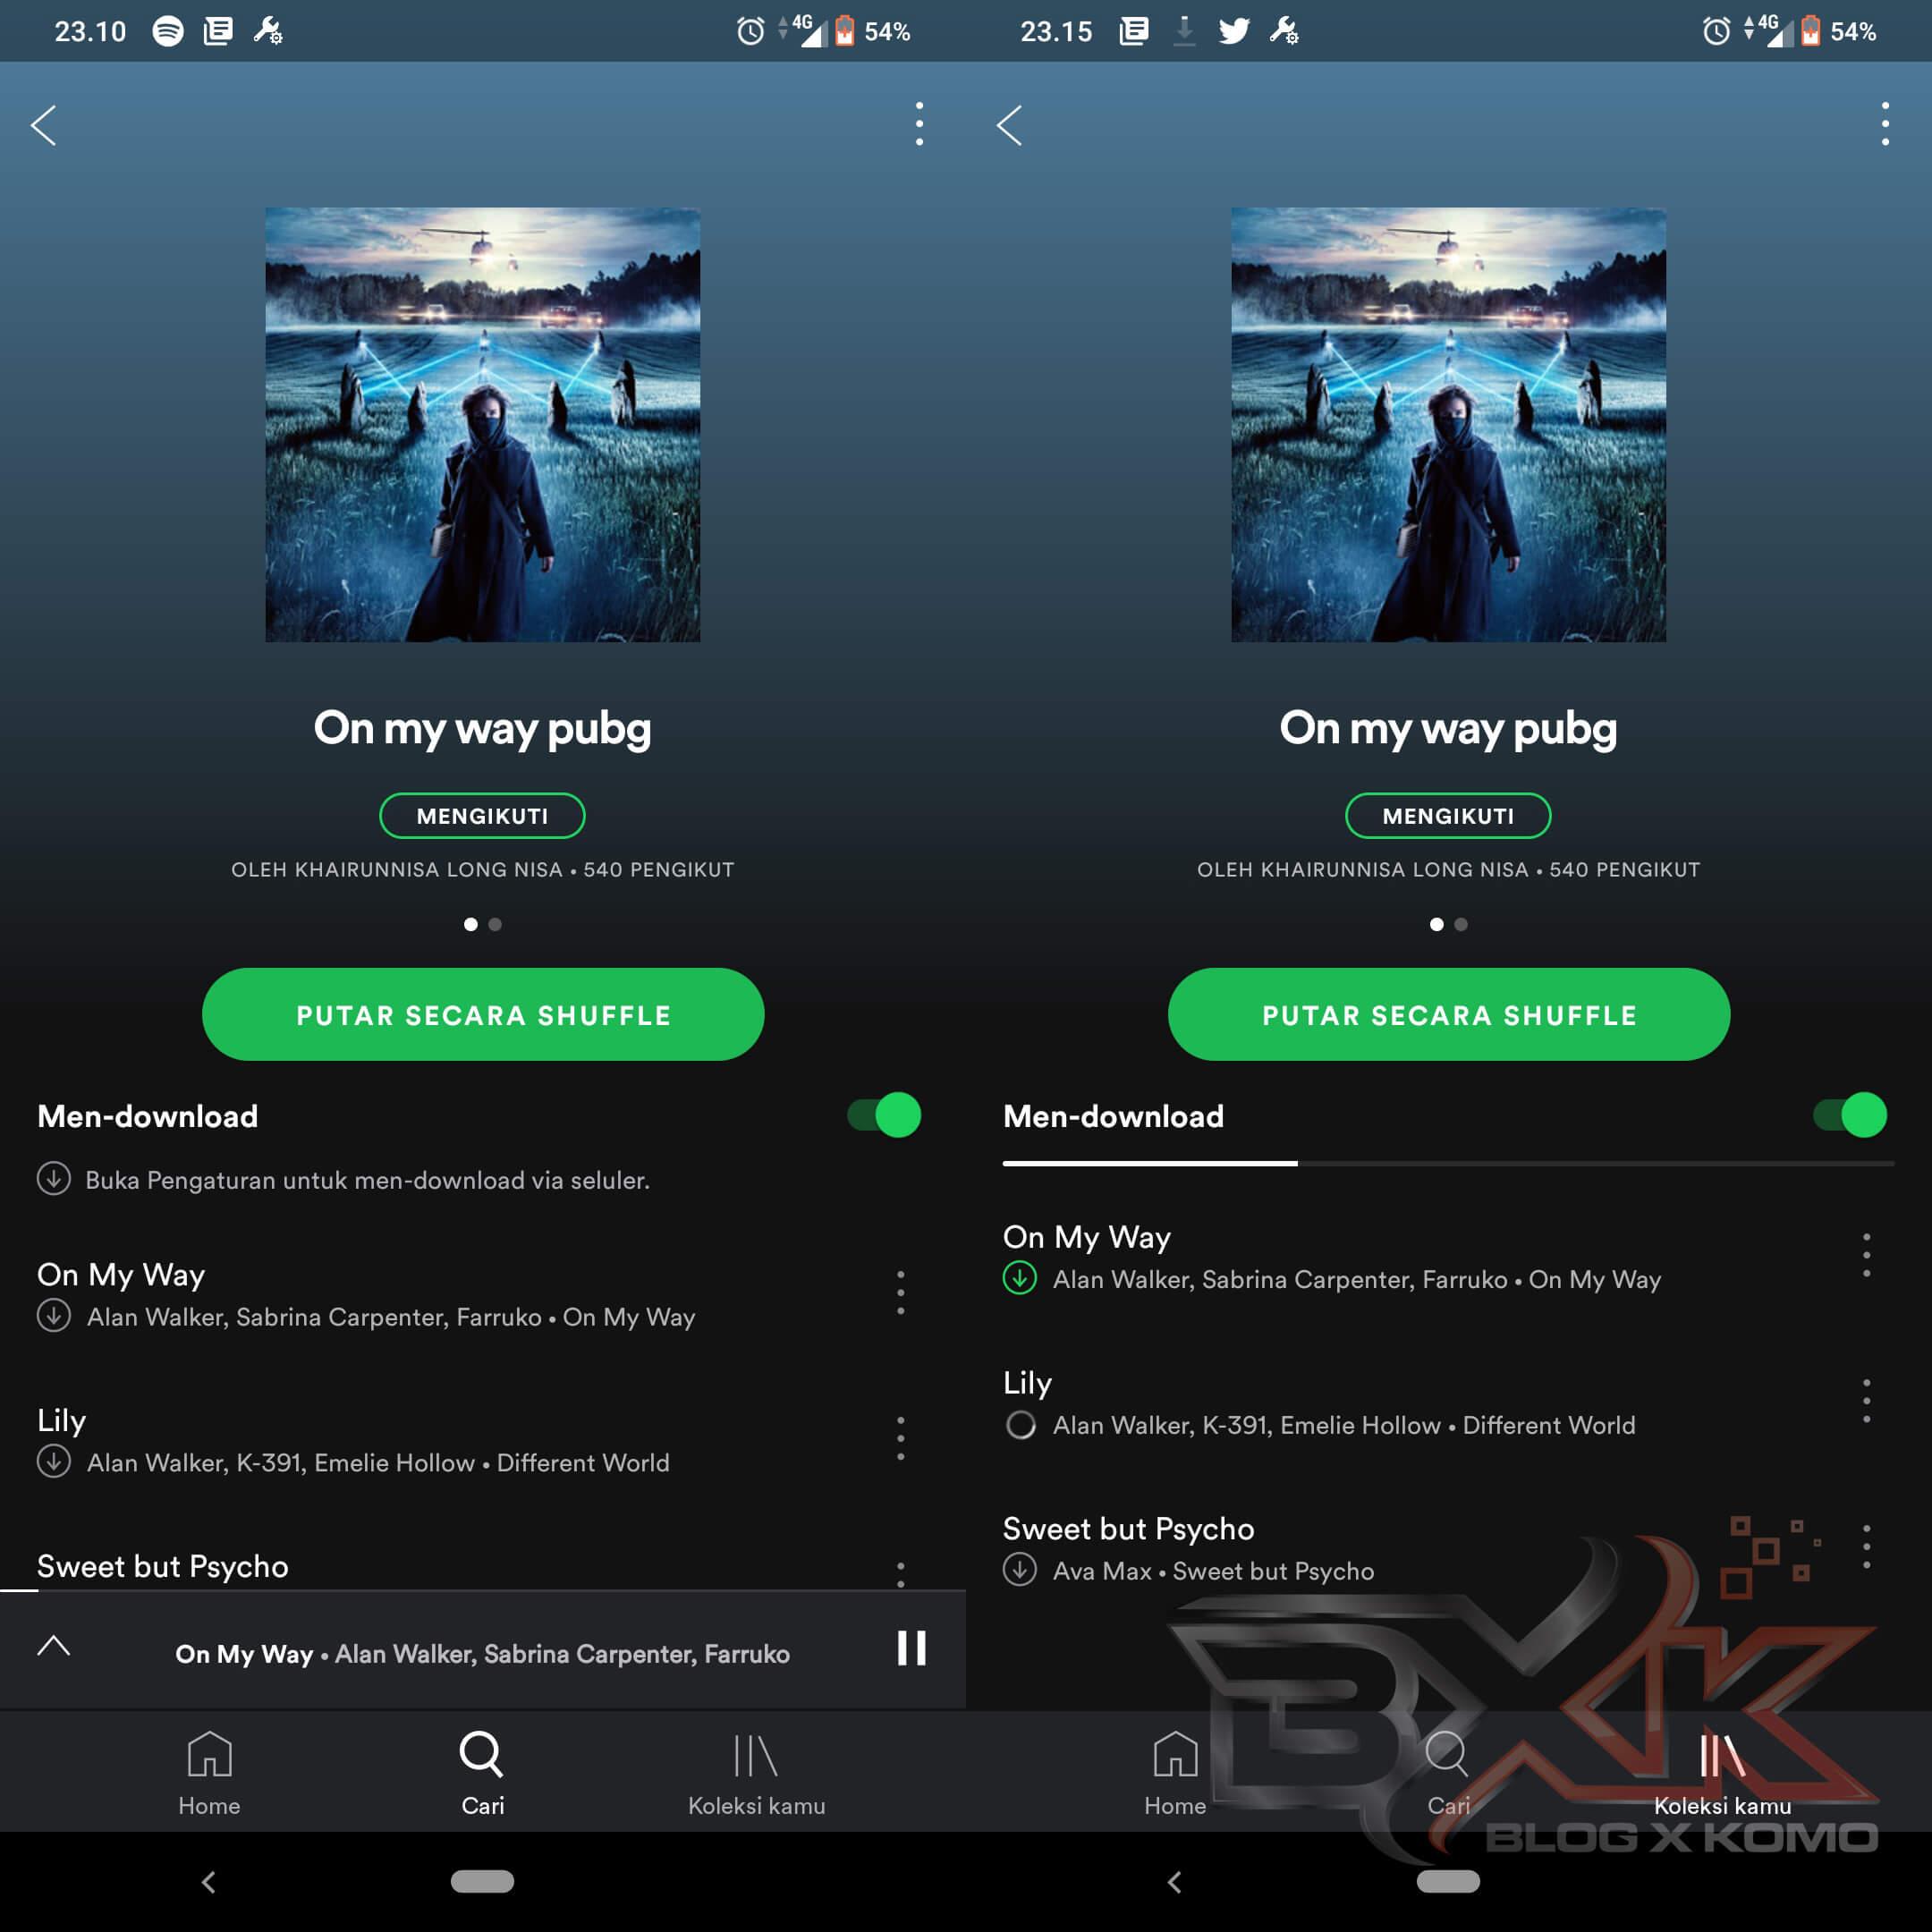 Download Lagu On My Way PUBG - Download Lewat Spotify